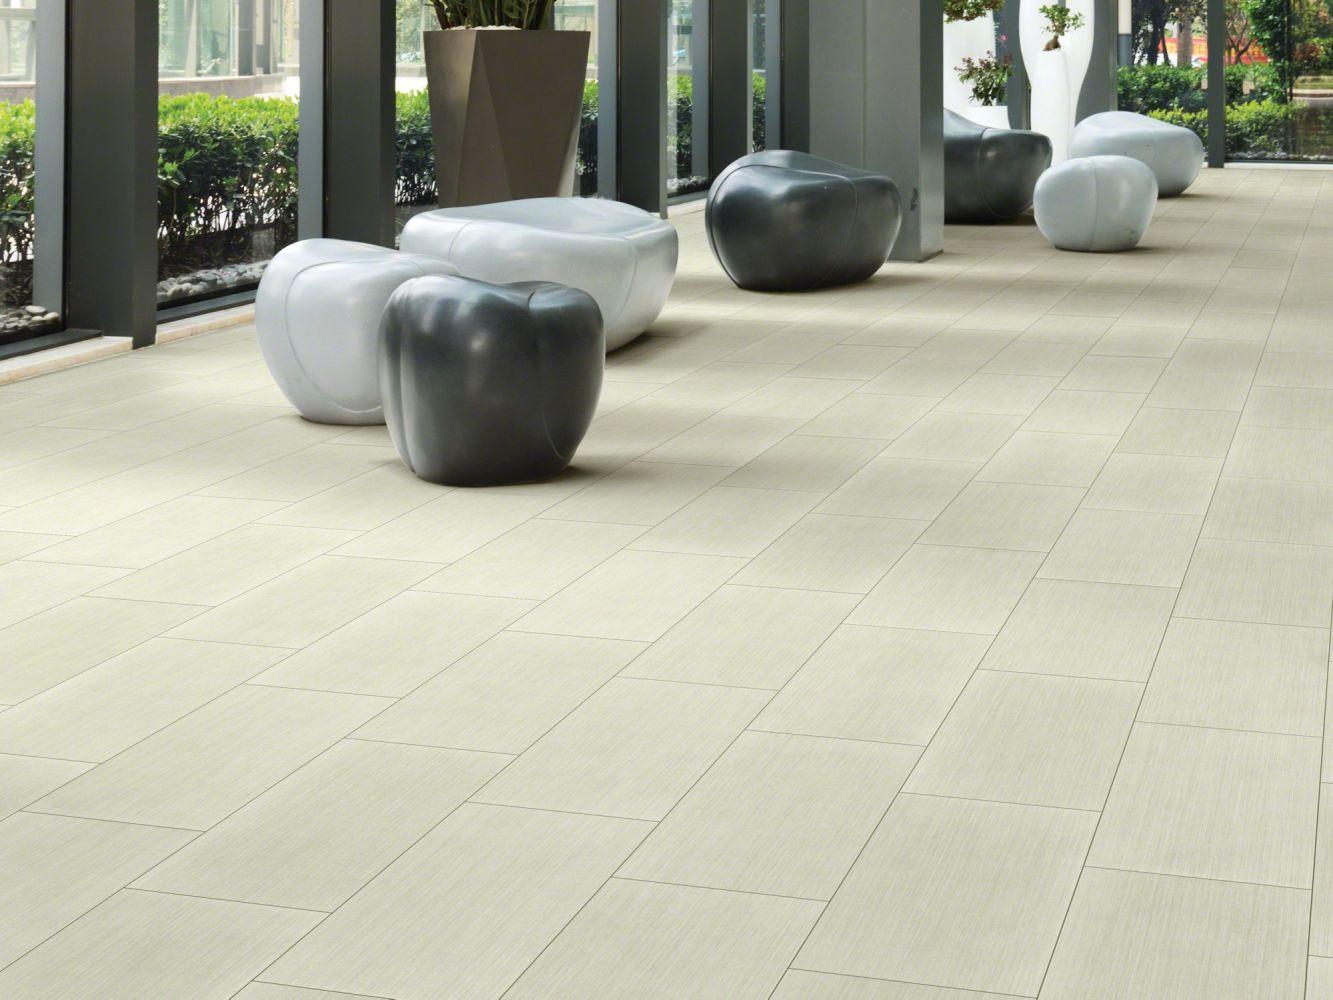 Shaw Floors Vinyl Home Foundations Turninstone 720c Plus Arid 00162_521RG